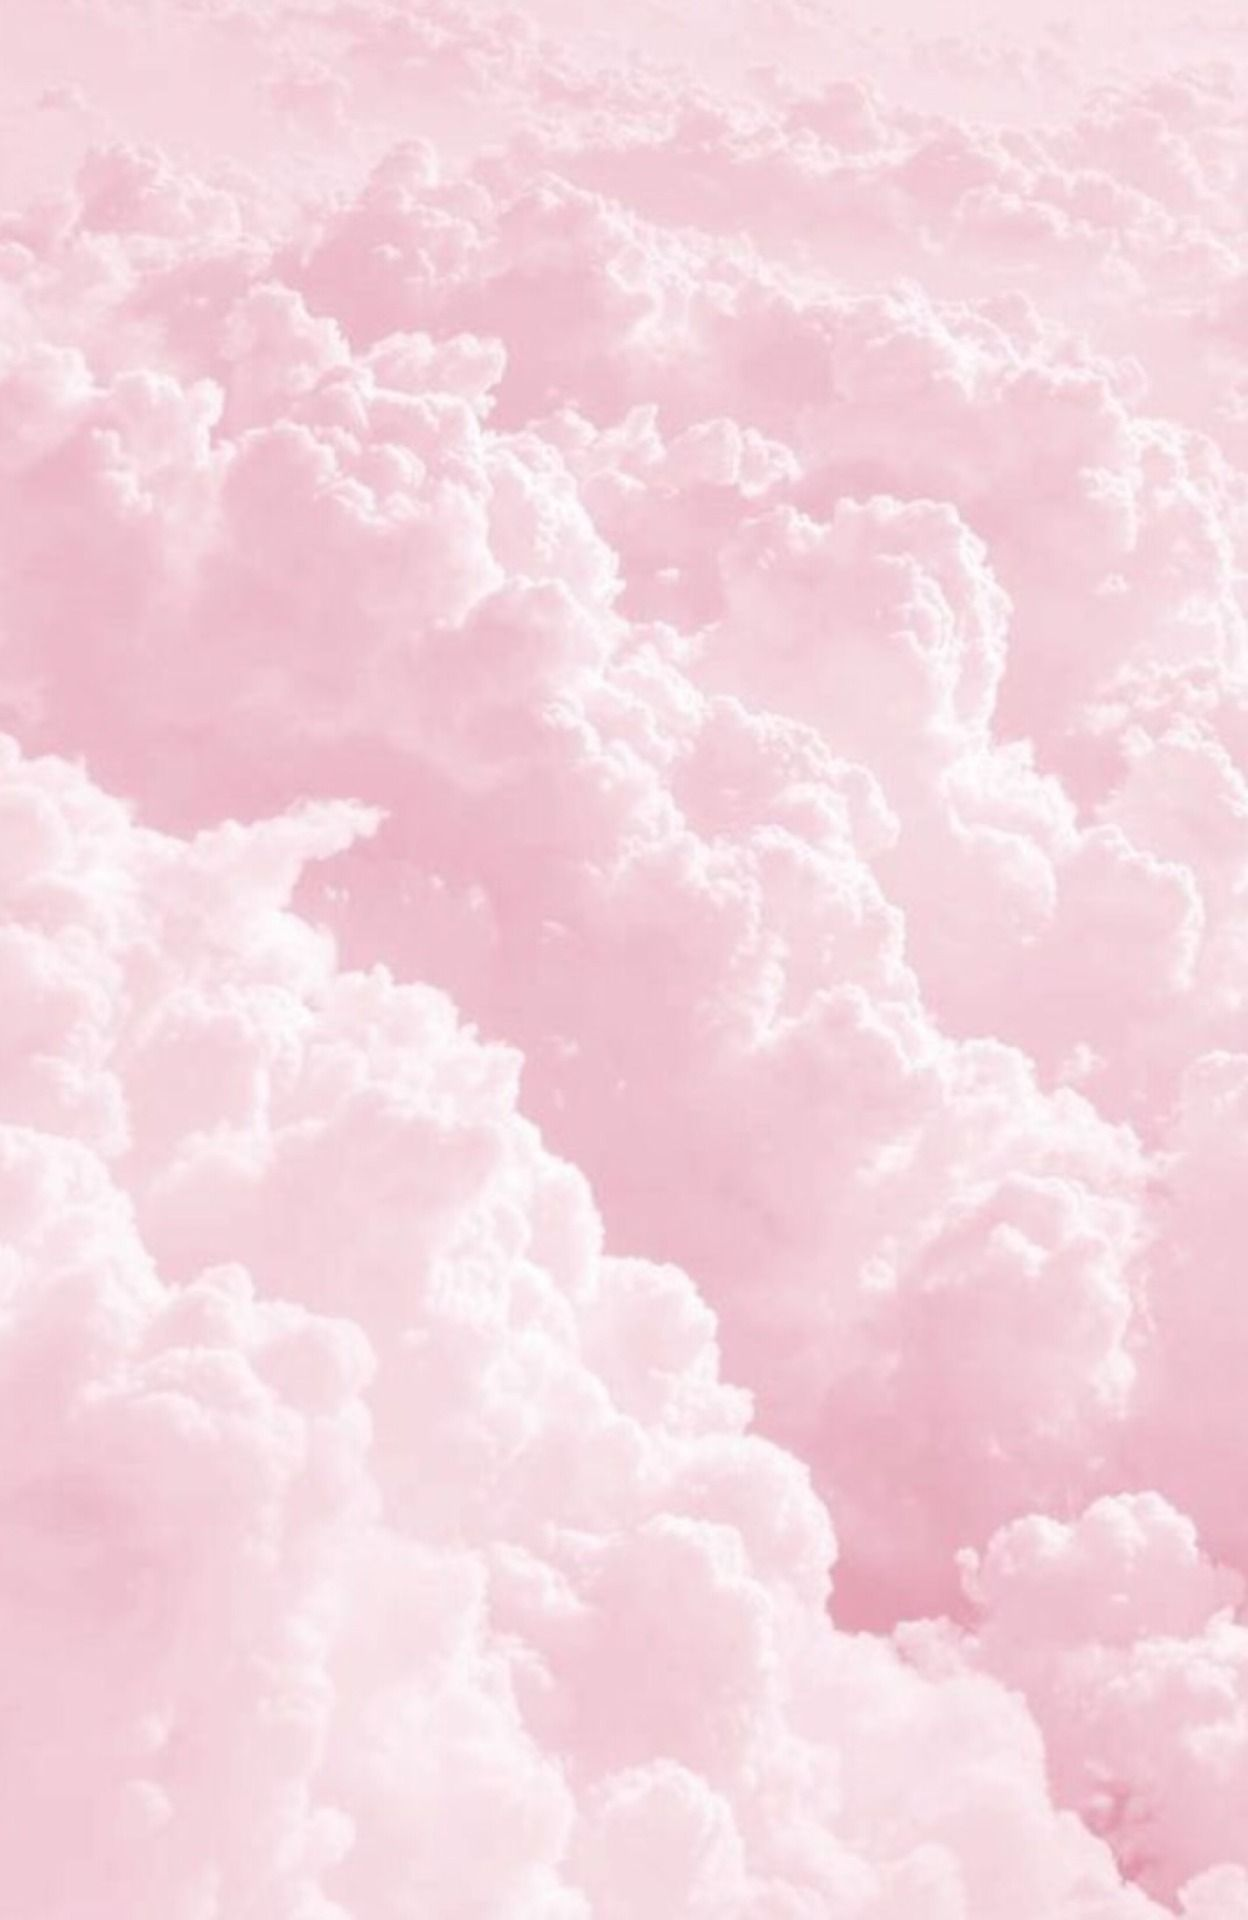 Pastel Pink Aesthetic Wallpapers   Top Pastel Pink Aesthetic 1248x1920